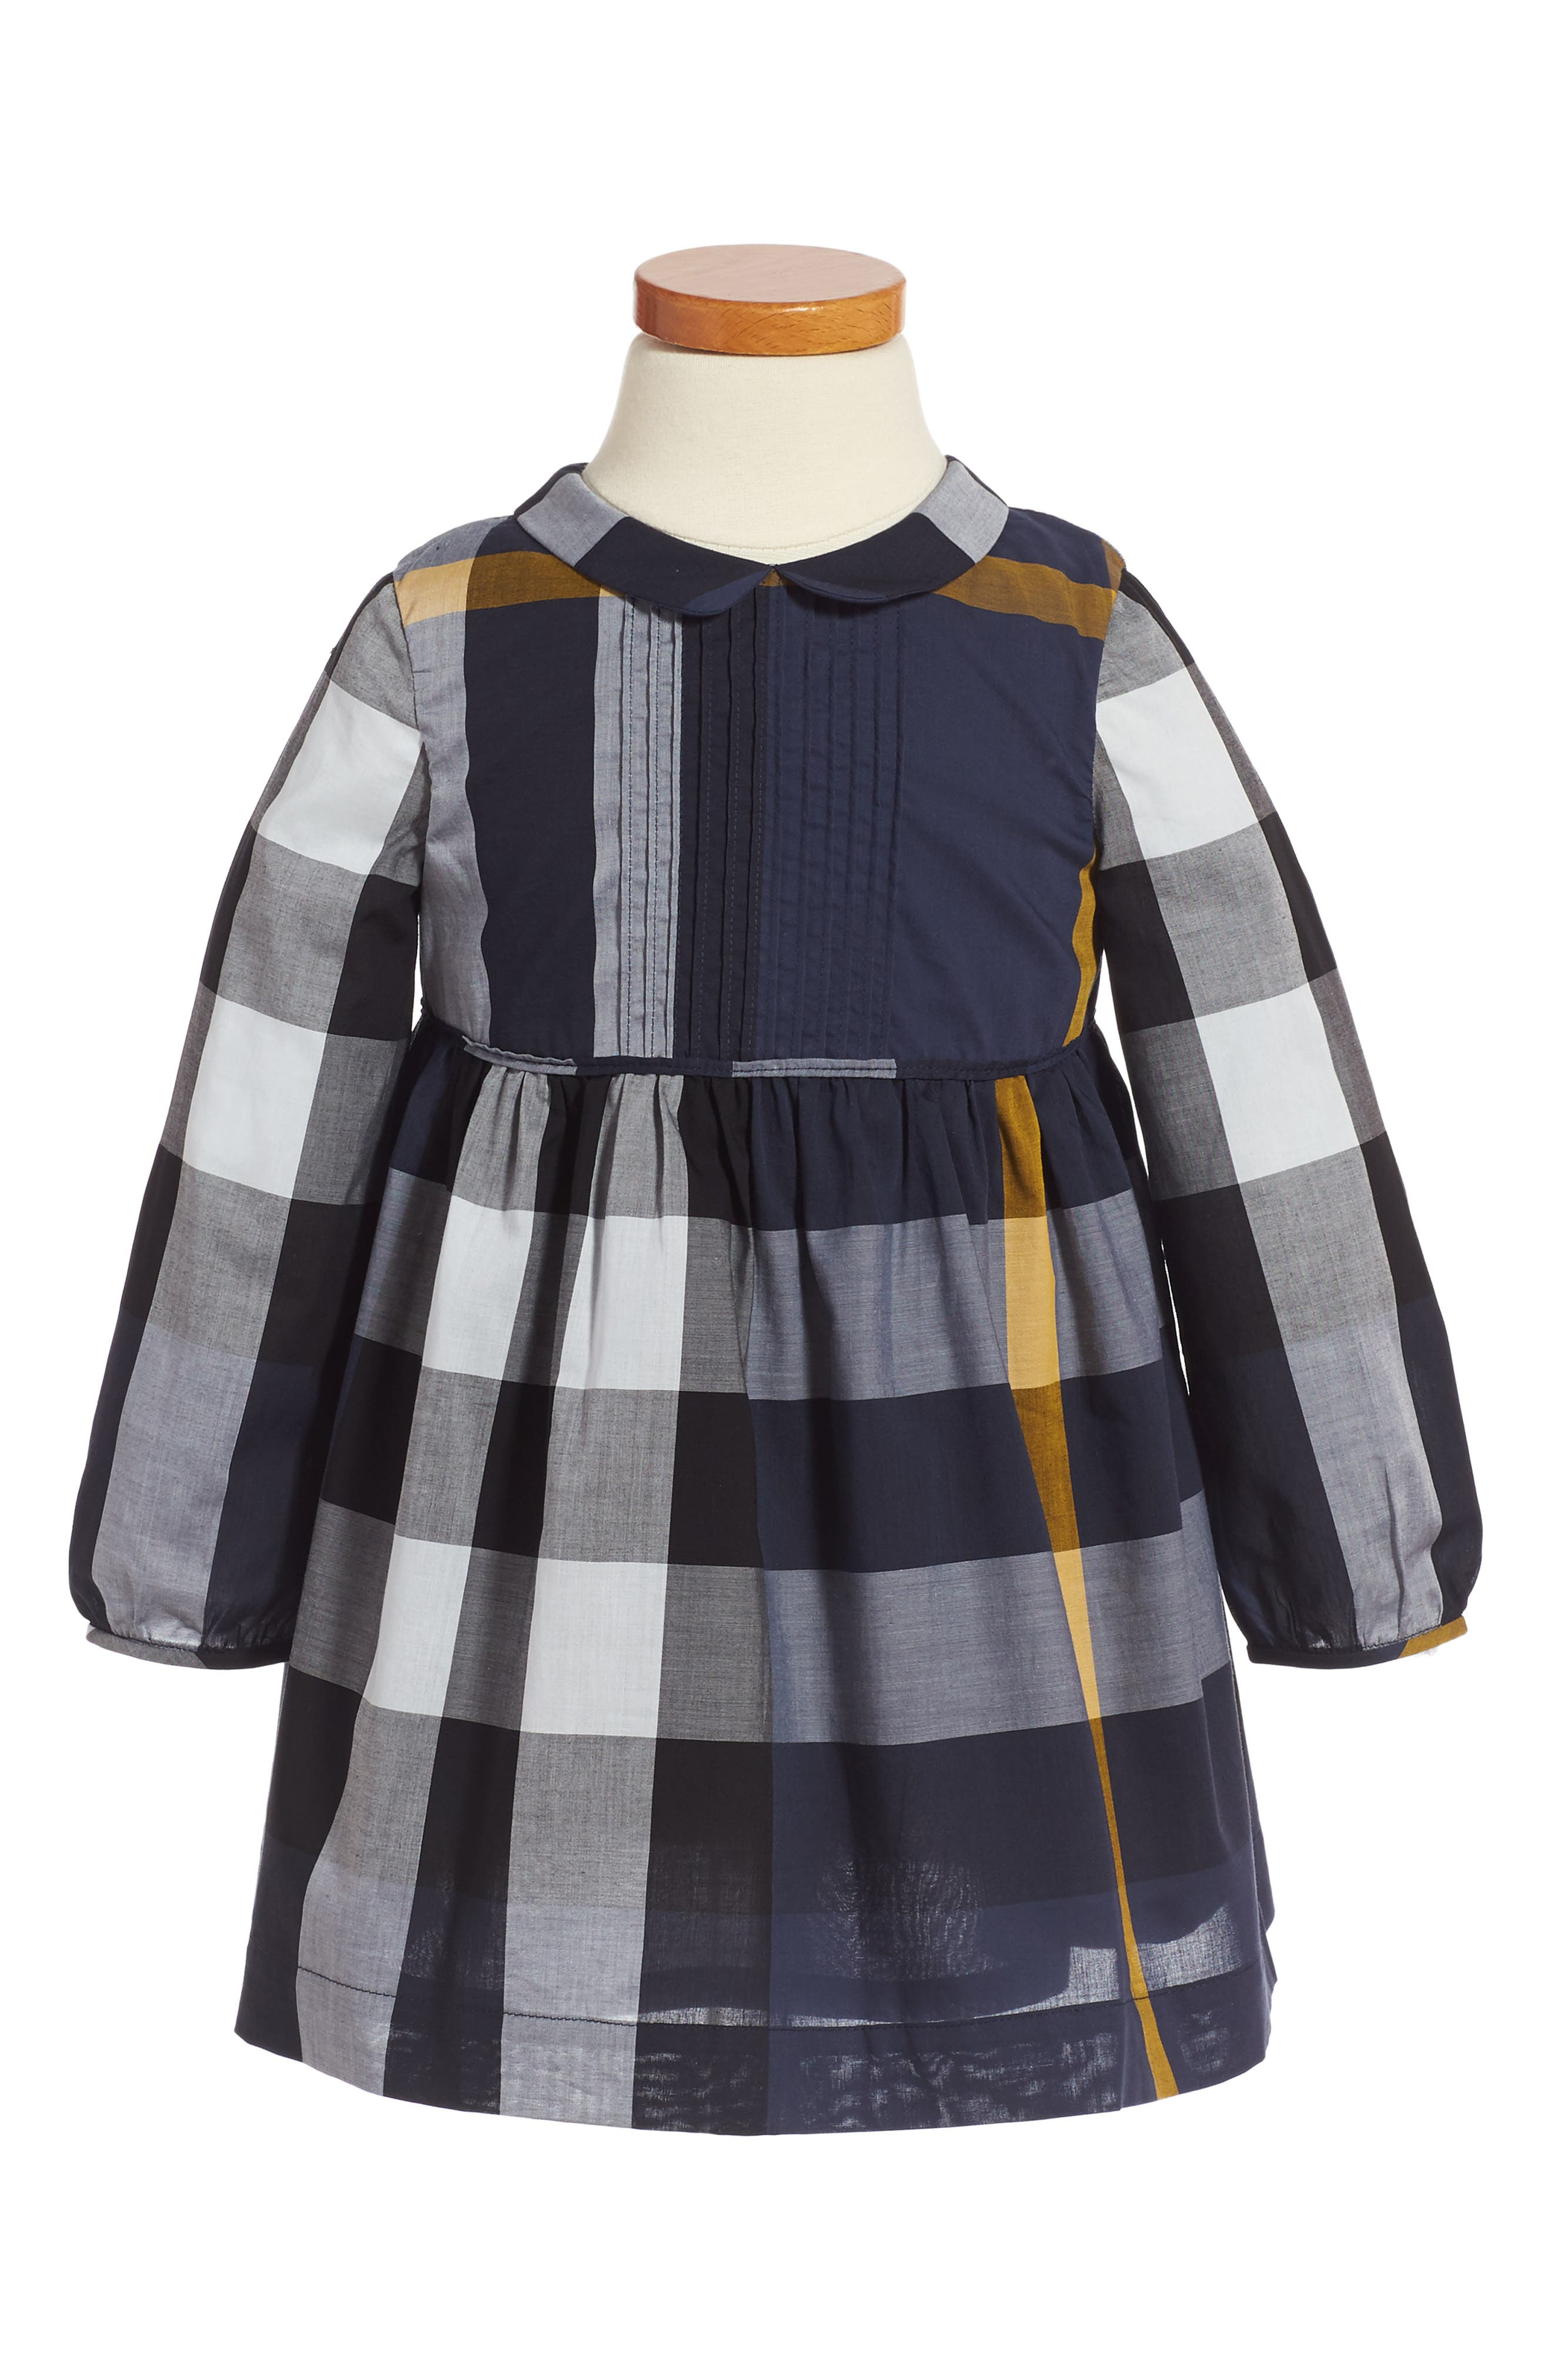 Main Image - Burberry Liza Dress (Toddler Girls)